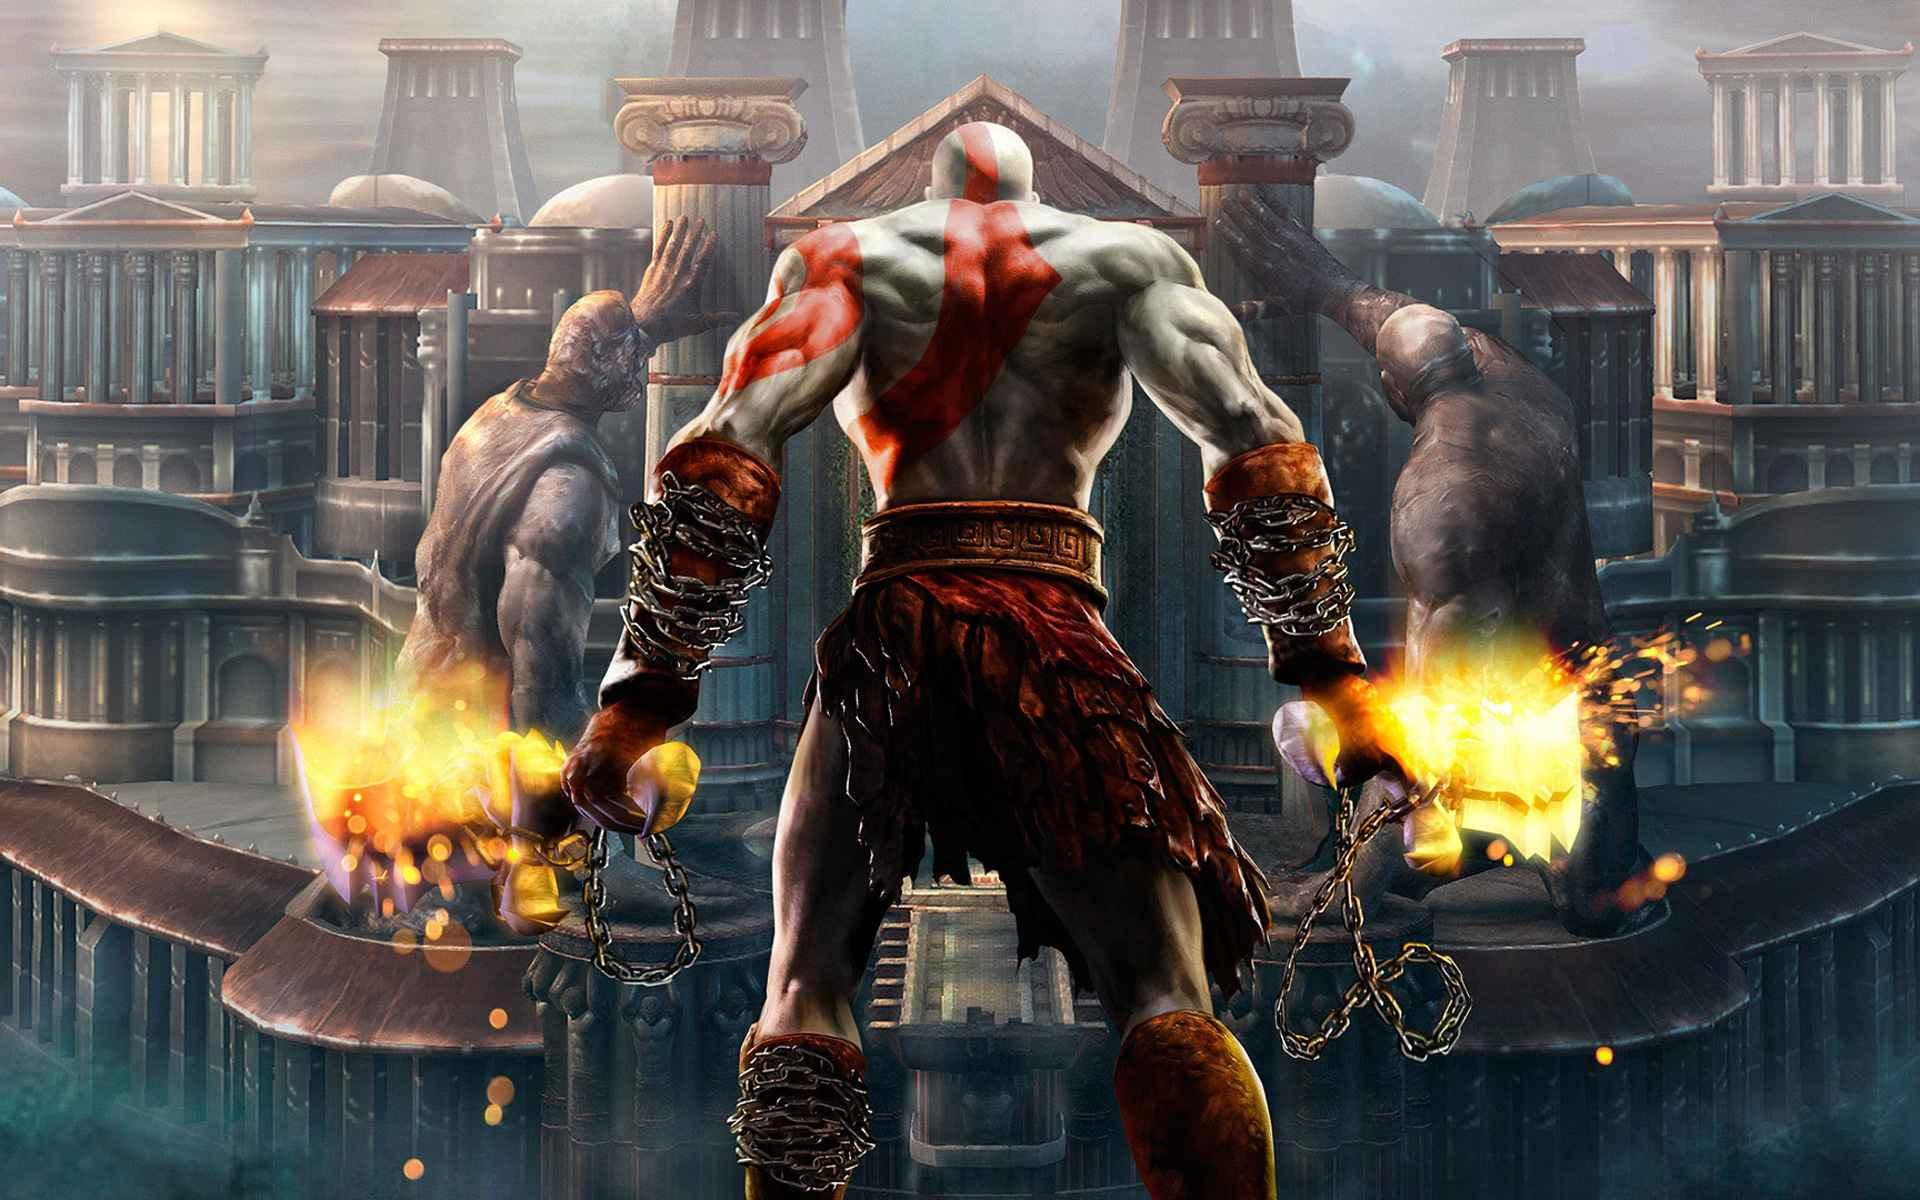 God of War Crafting, Customization and Progression Video